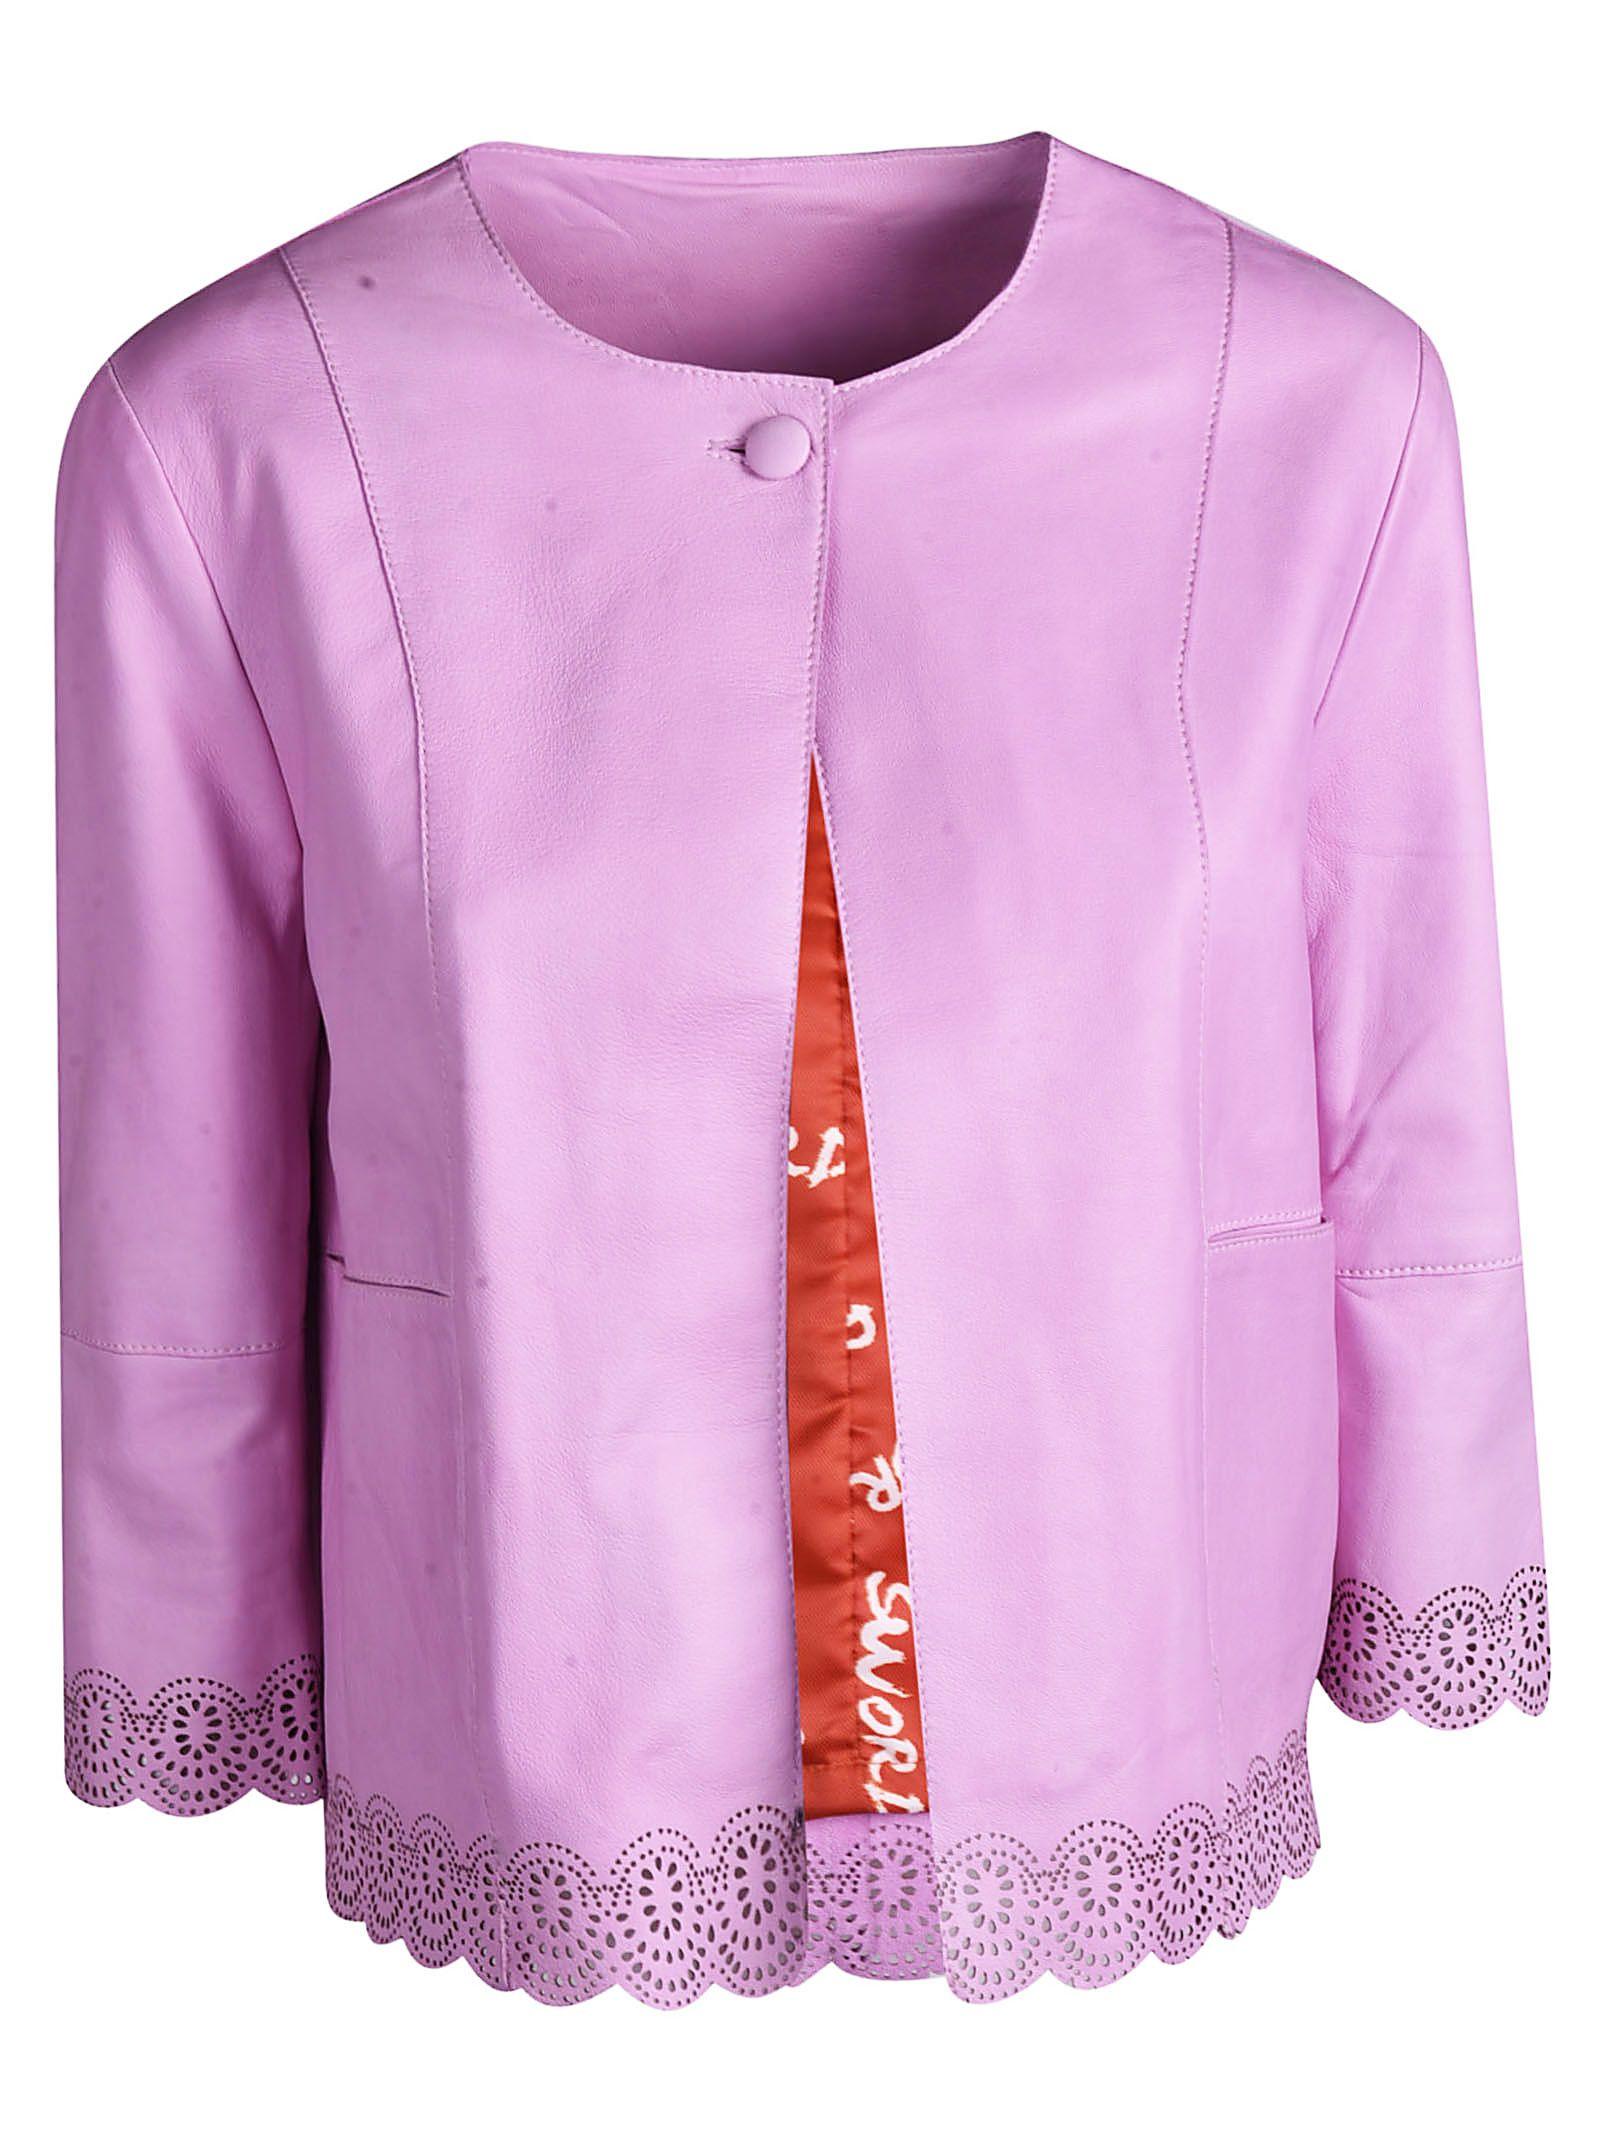 d67b8d5dc6d6 S.W.O.R.D 6.6.44 S.w.o.r.d 6.6.44 Cropped Leather Jacket - Pink ...